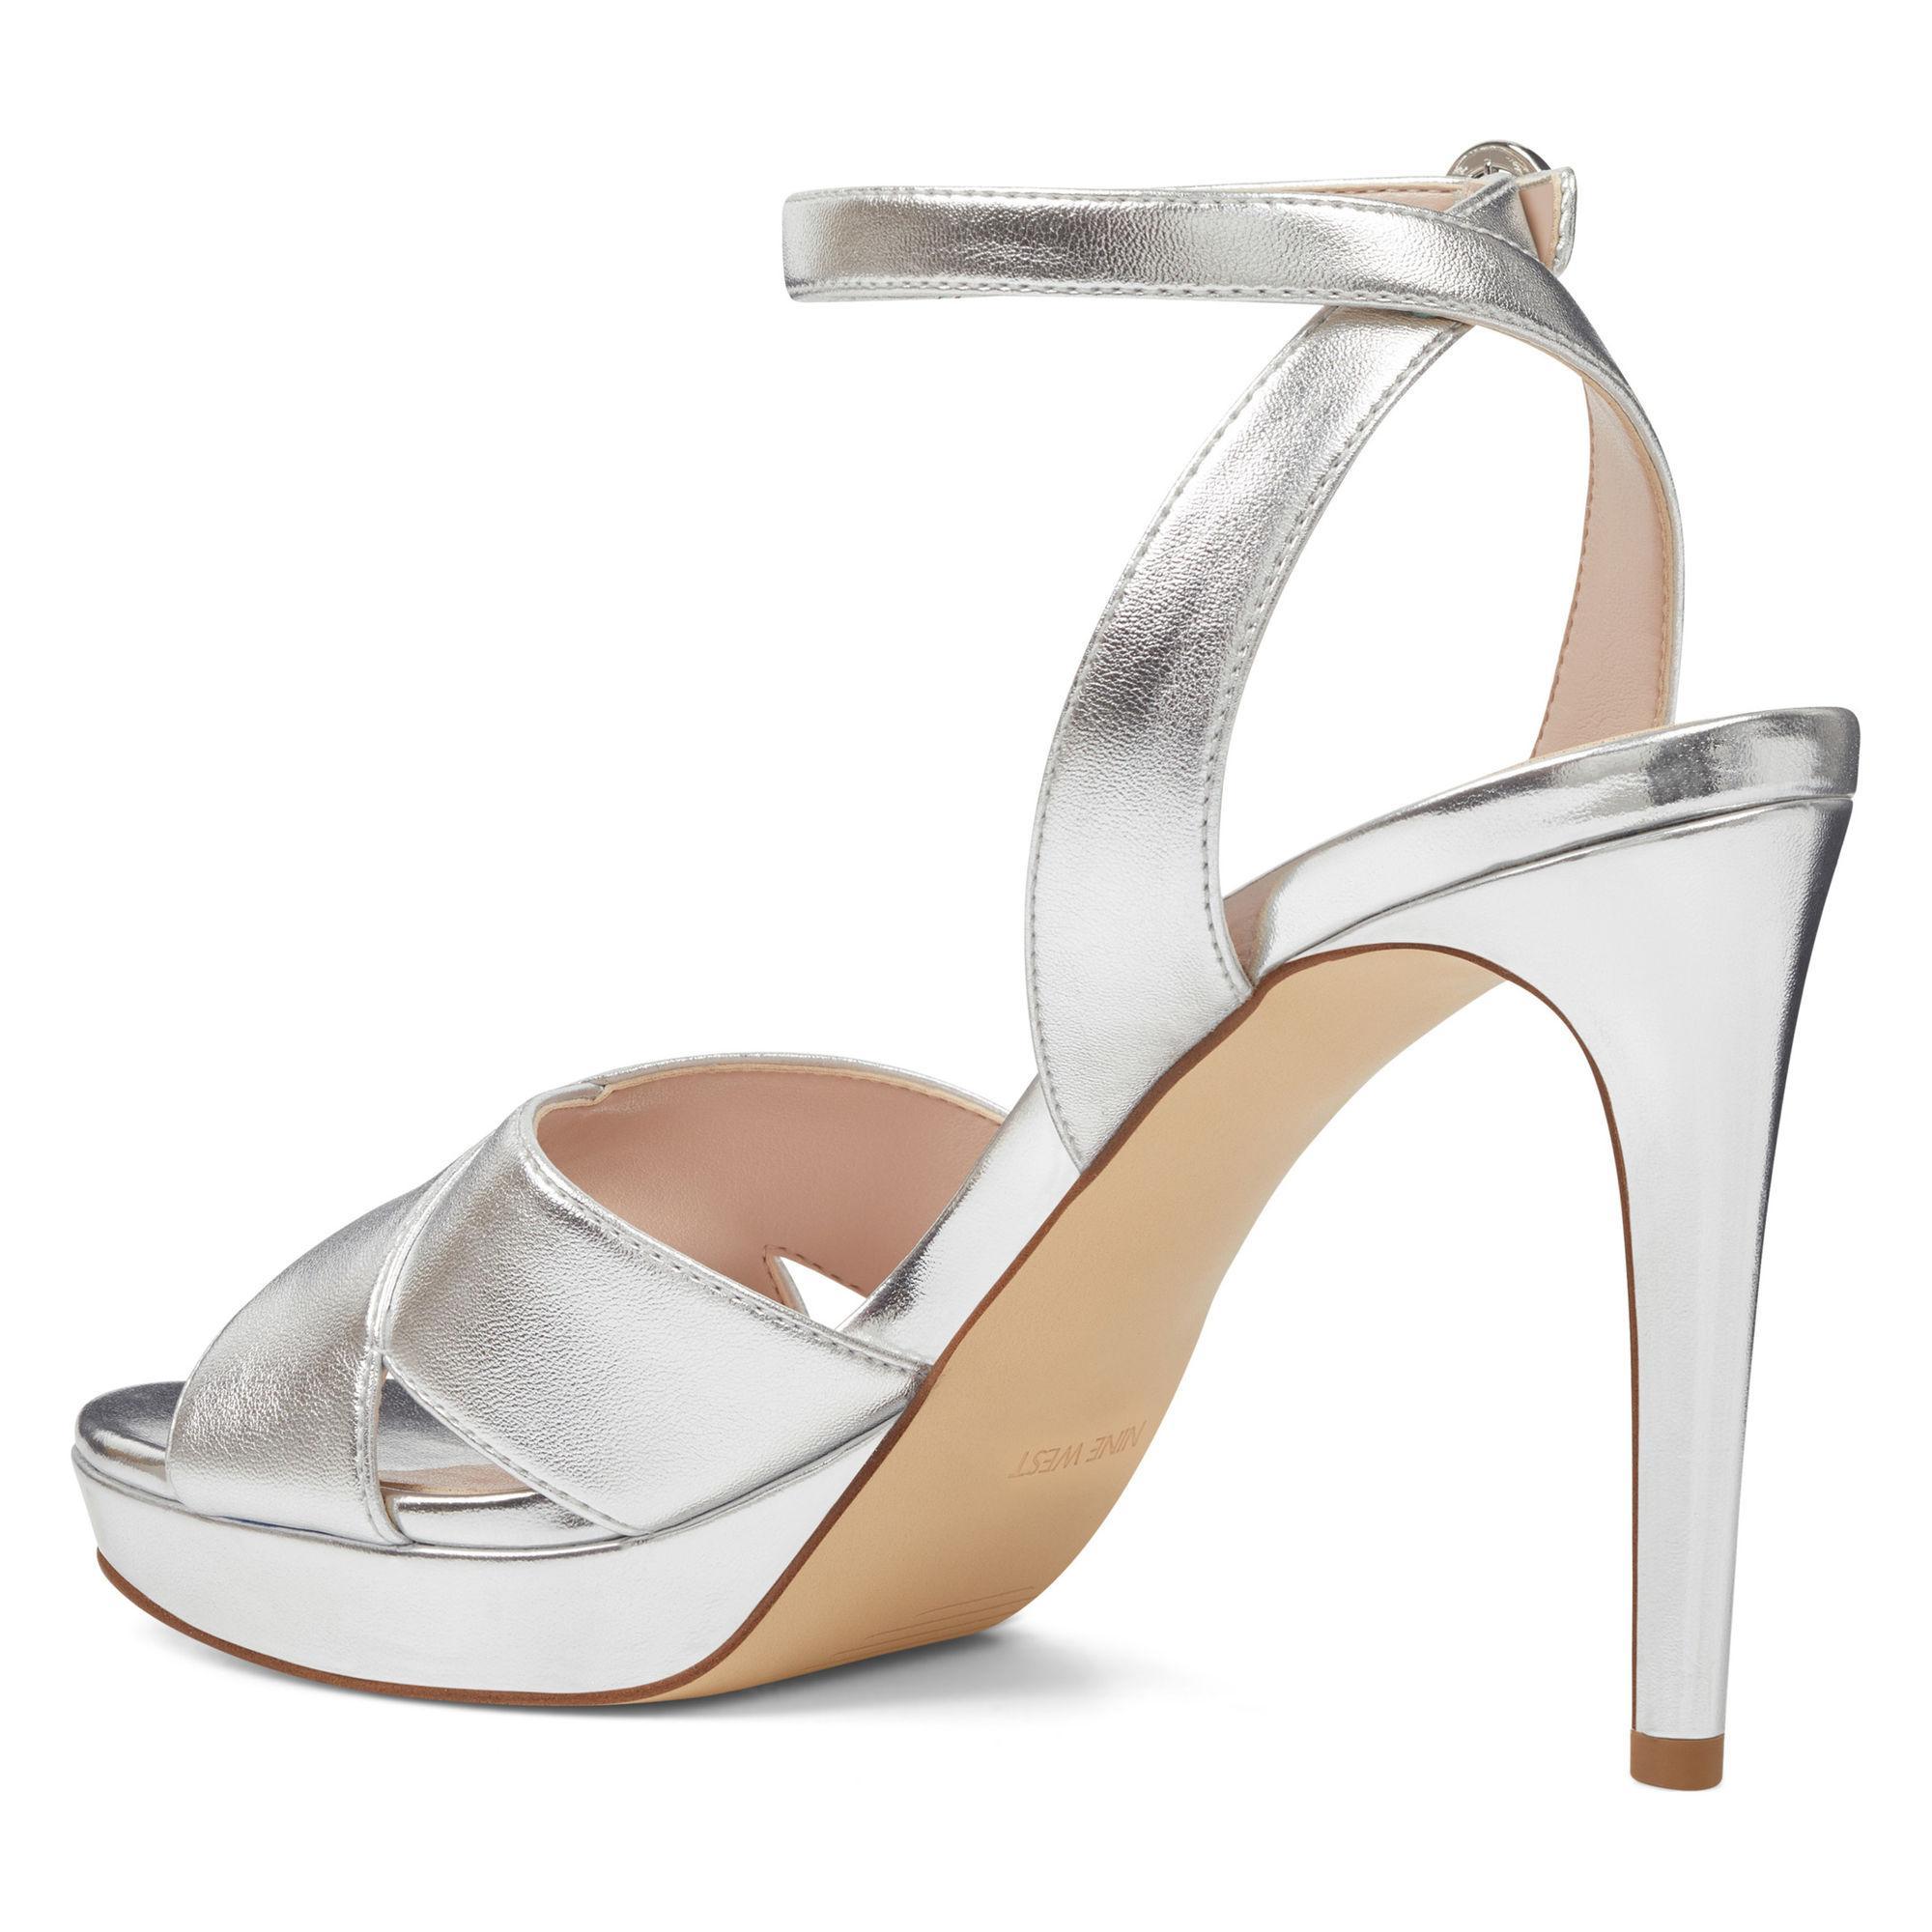 e8d5a86e2def Lyst - Nine West Quisha Ankle Strap Sandals in Metallic